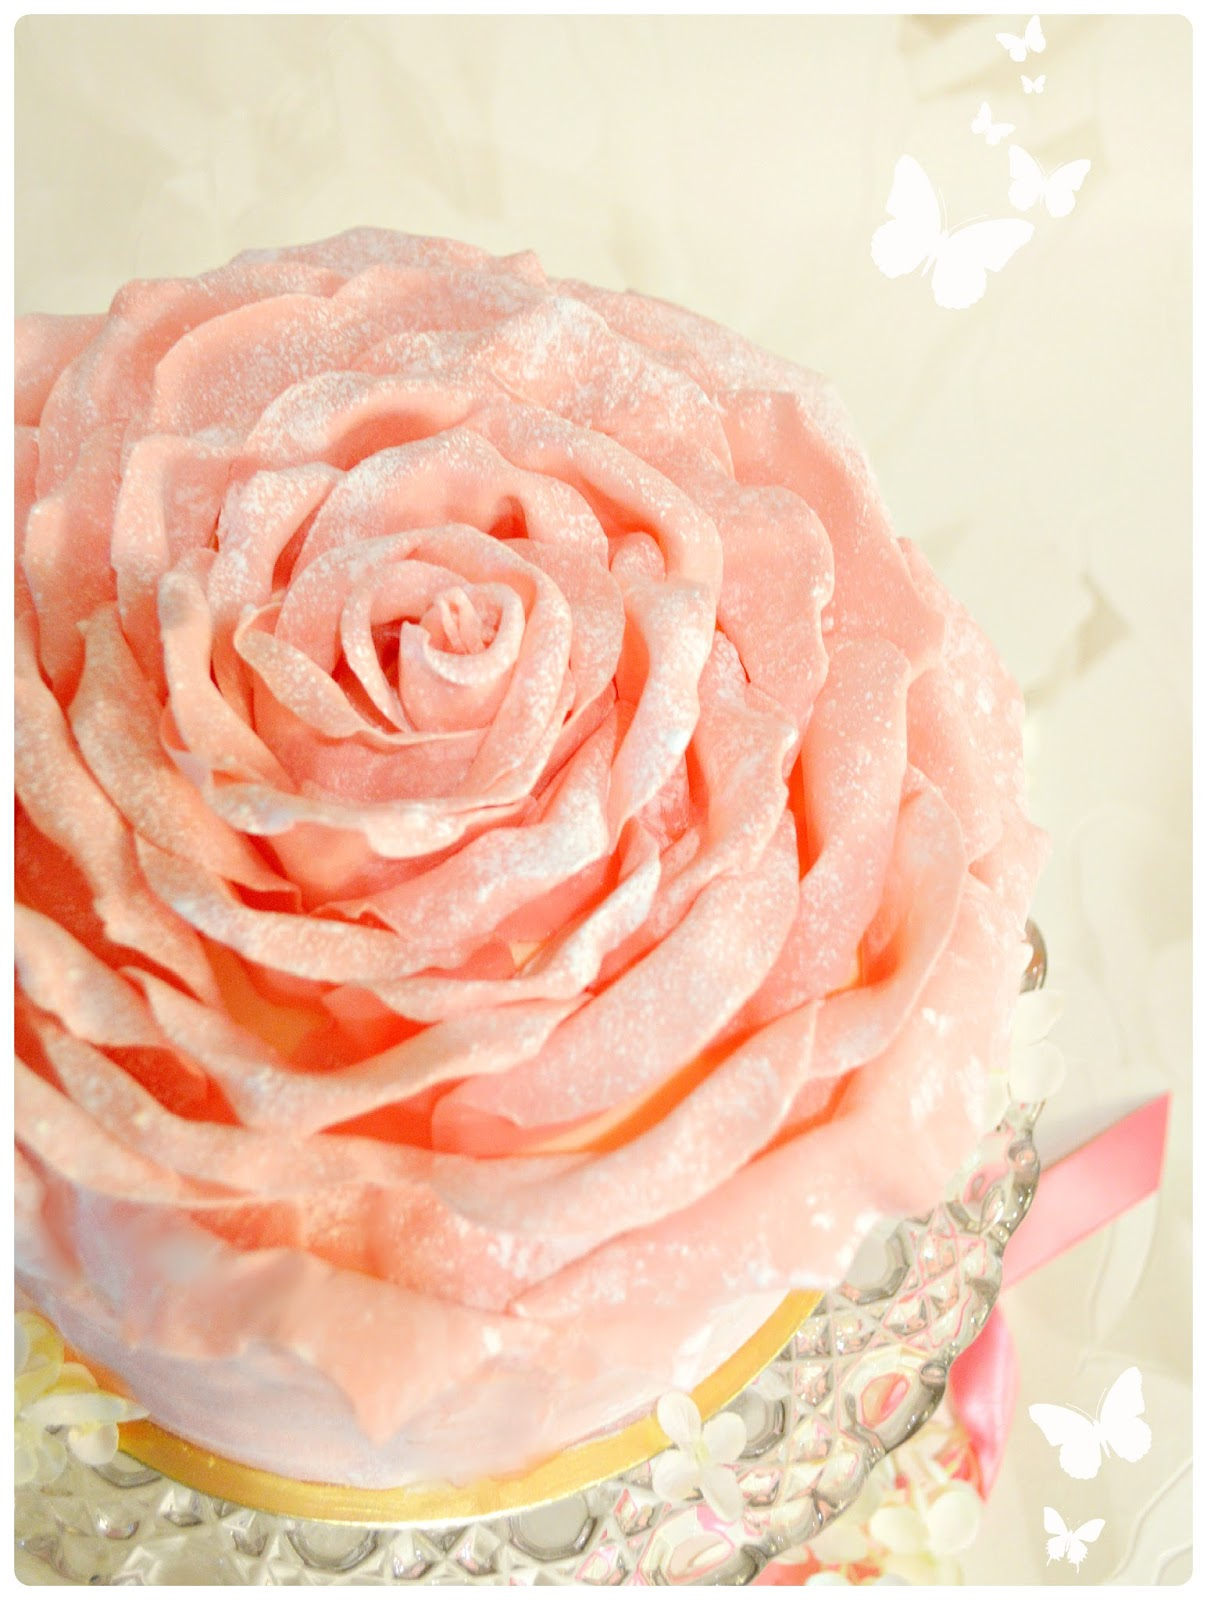 Strawberry Chocolate Rose Petal Birthday Cake London Cherie Kelly